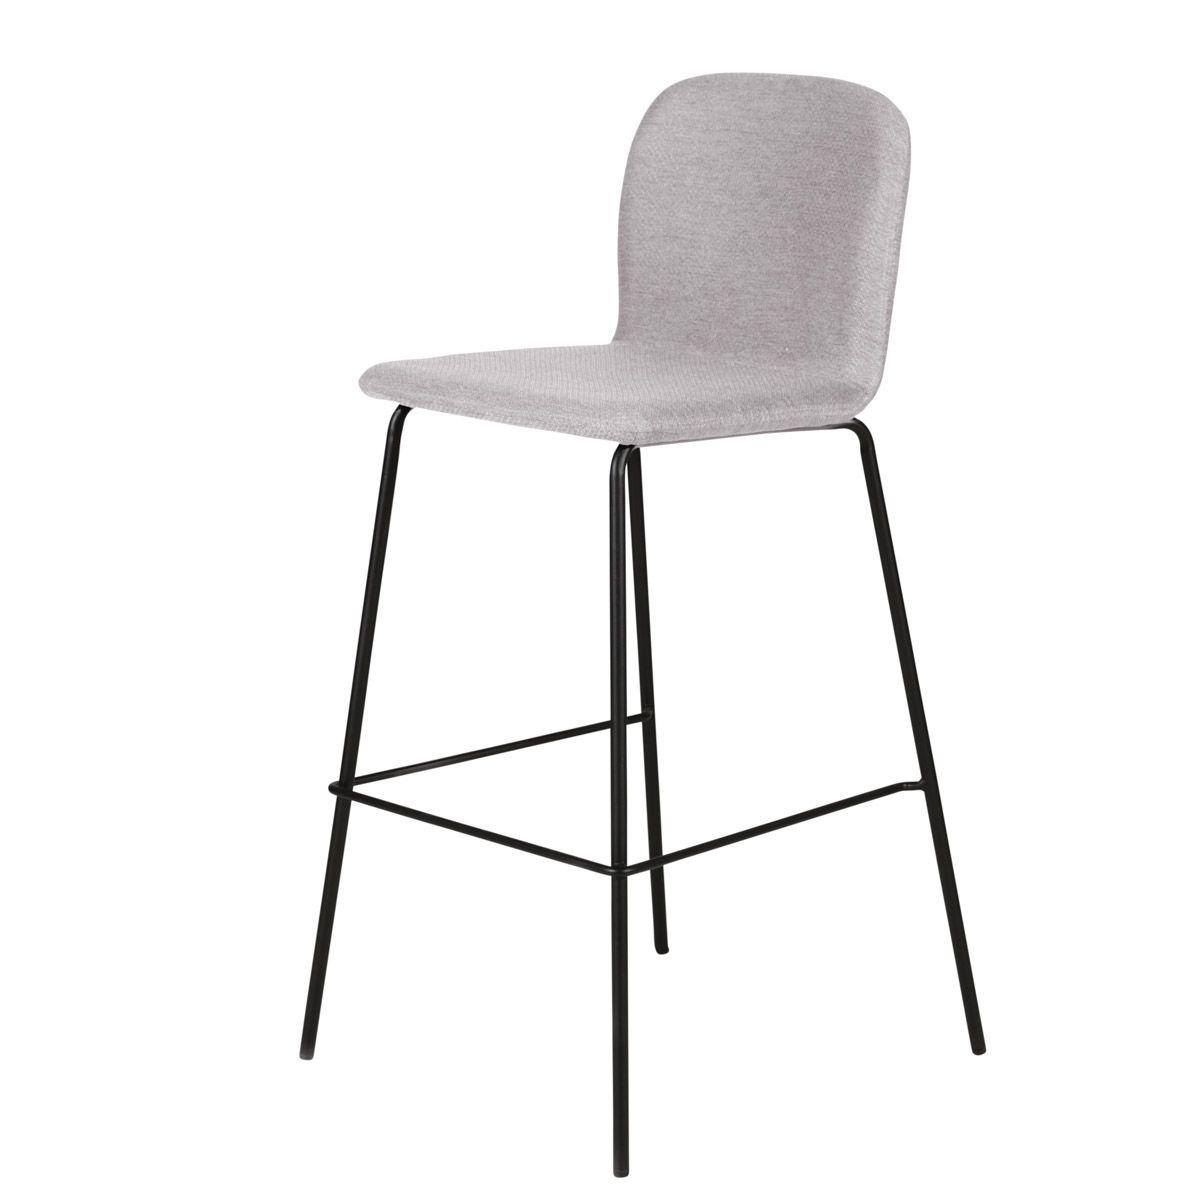 Chaise plan de travail tissu gris clair pieds métal h65